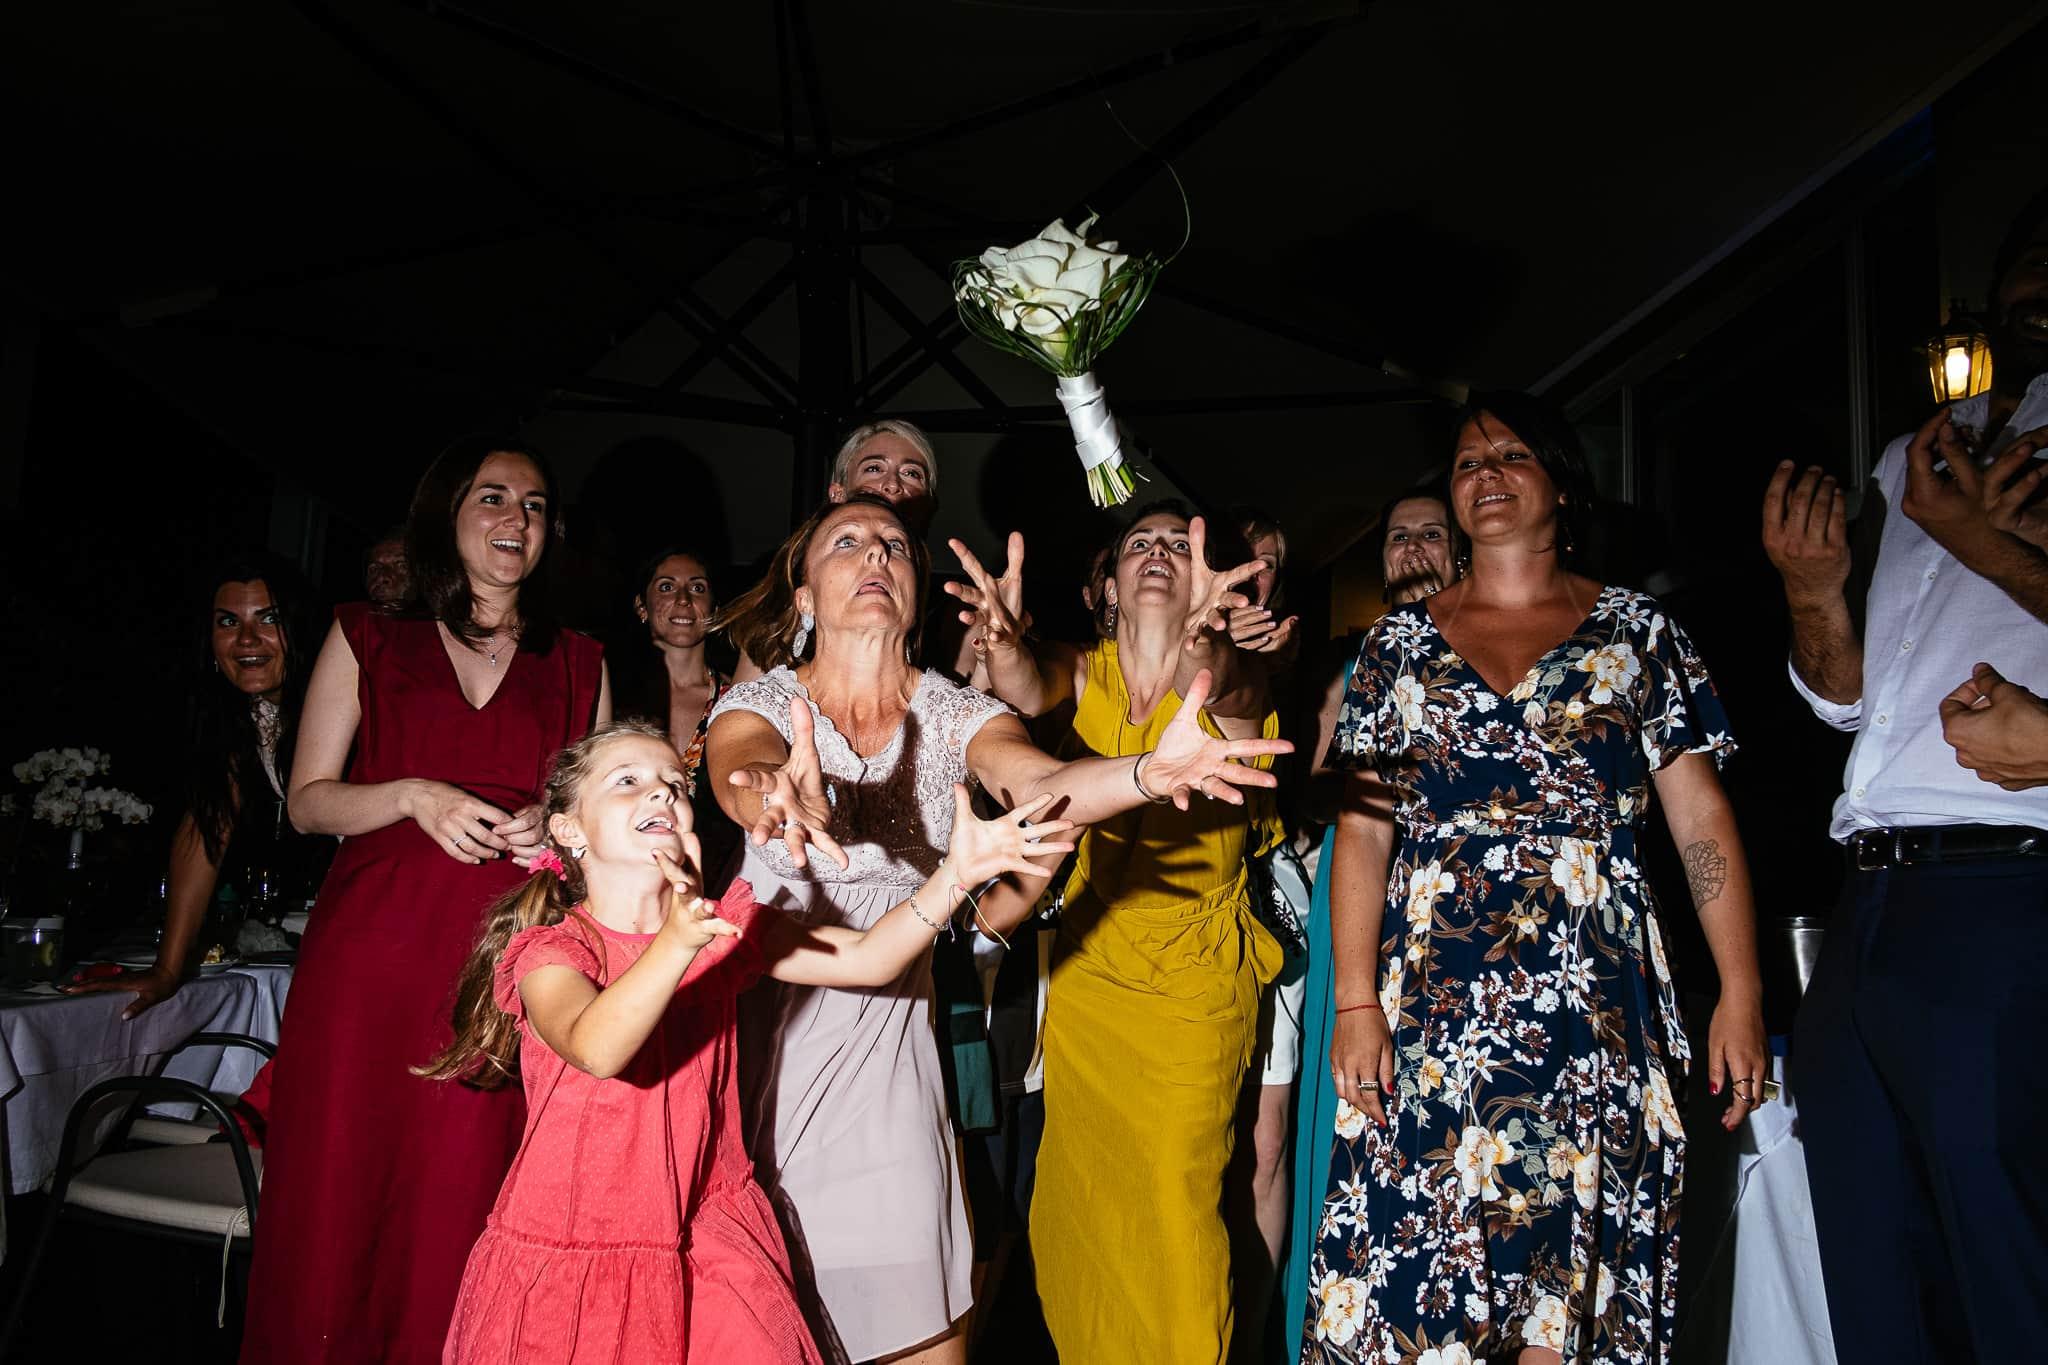 matrimonio Canter Milano San siro Luca rossi wedding reportage 0069